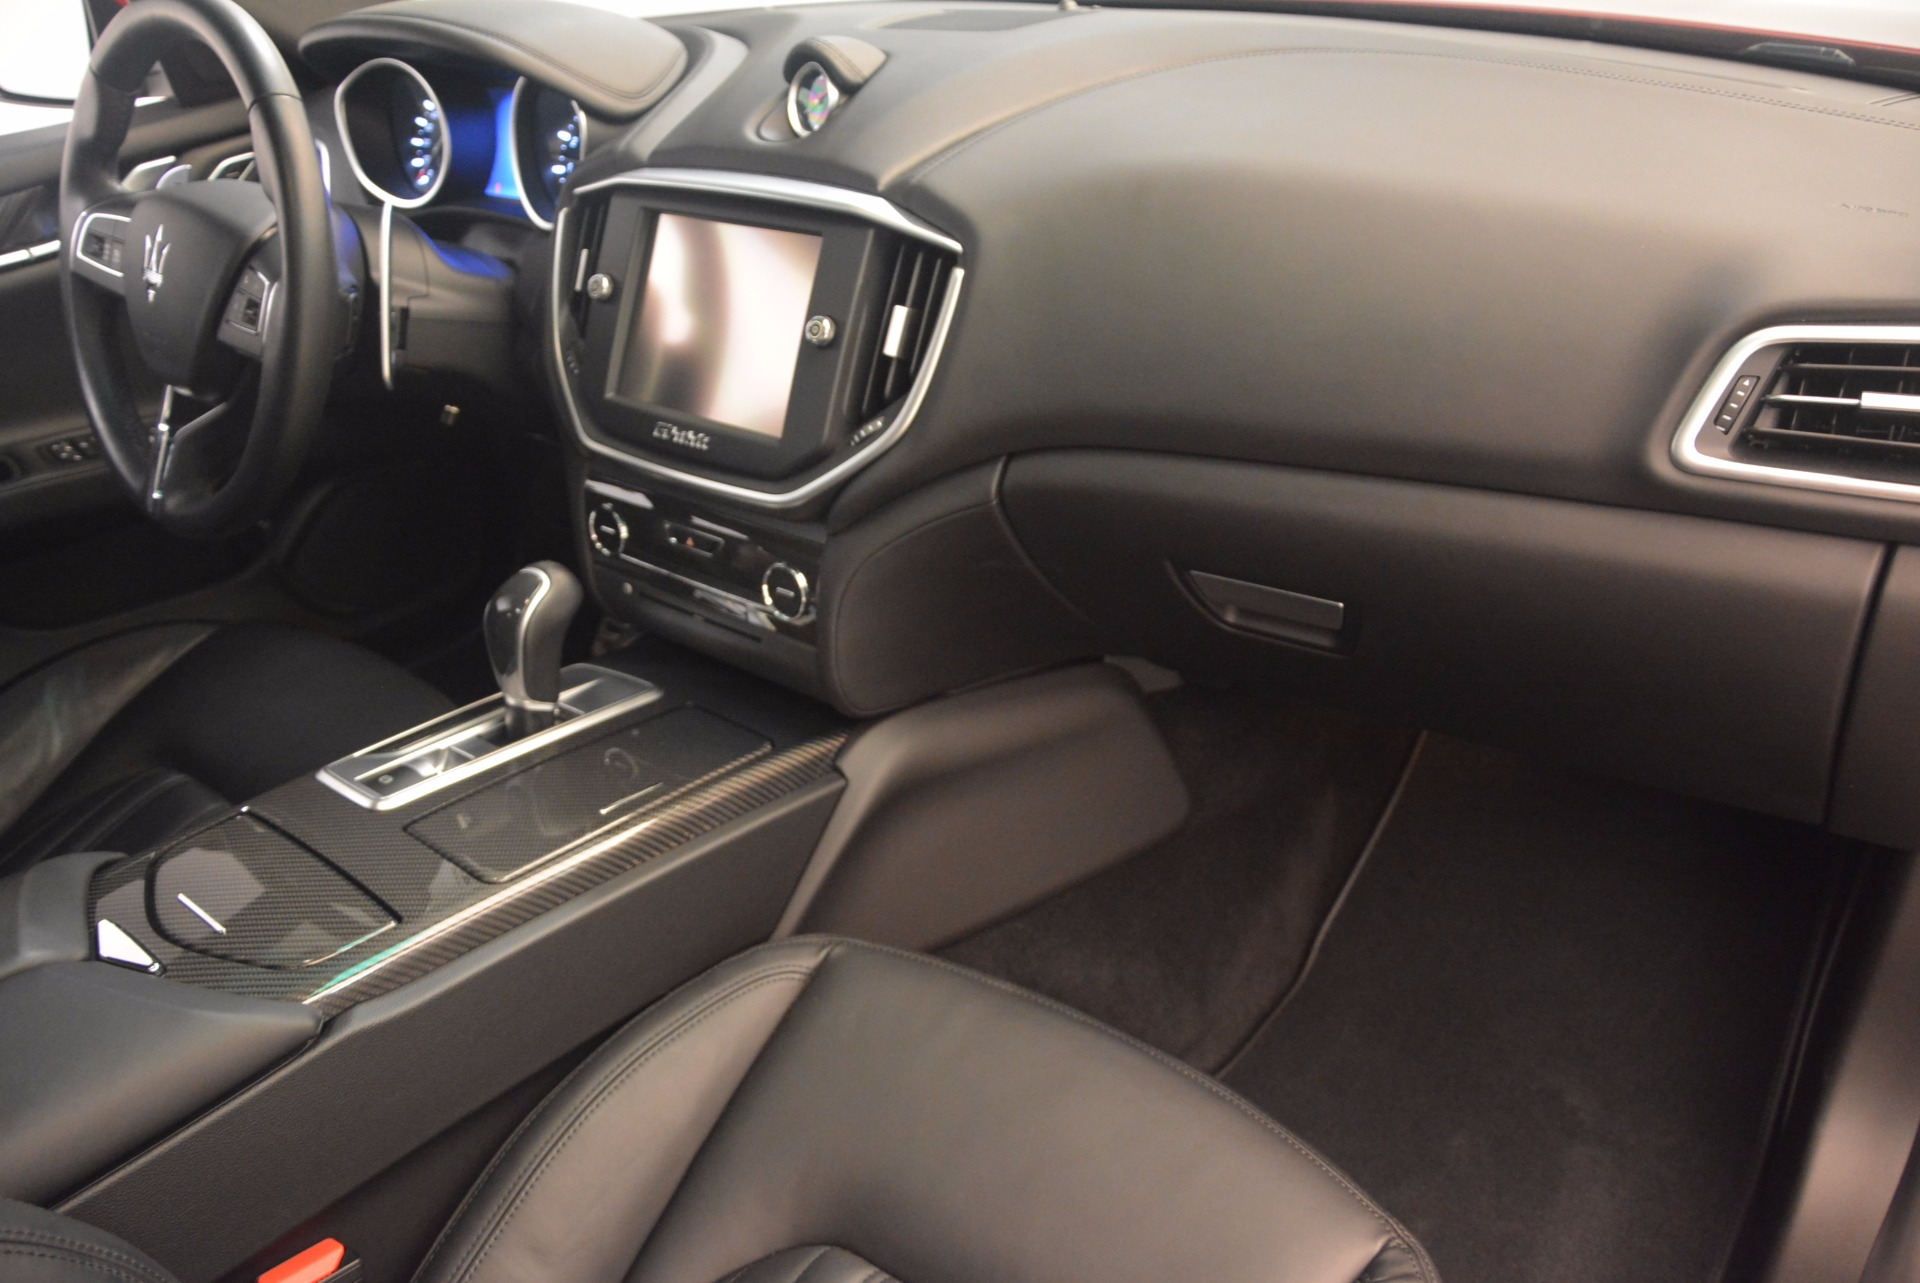 Used 2014 Maserati Ghibli S Q4 For Sale In Greenwich, CT. Alfa Romeo of Greenwich, 7203 1158_p19